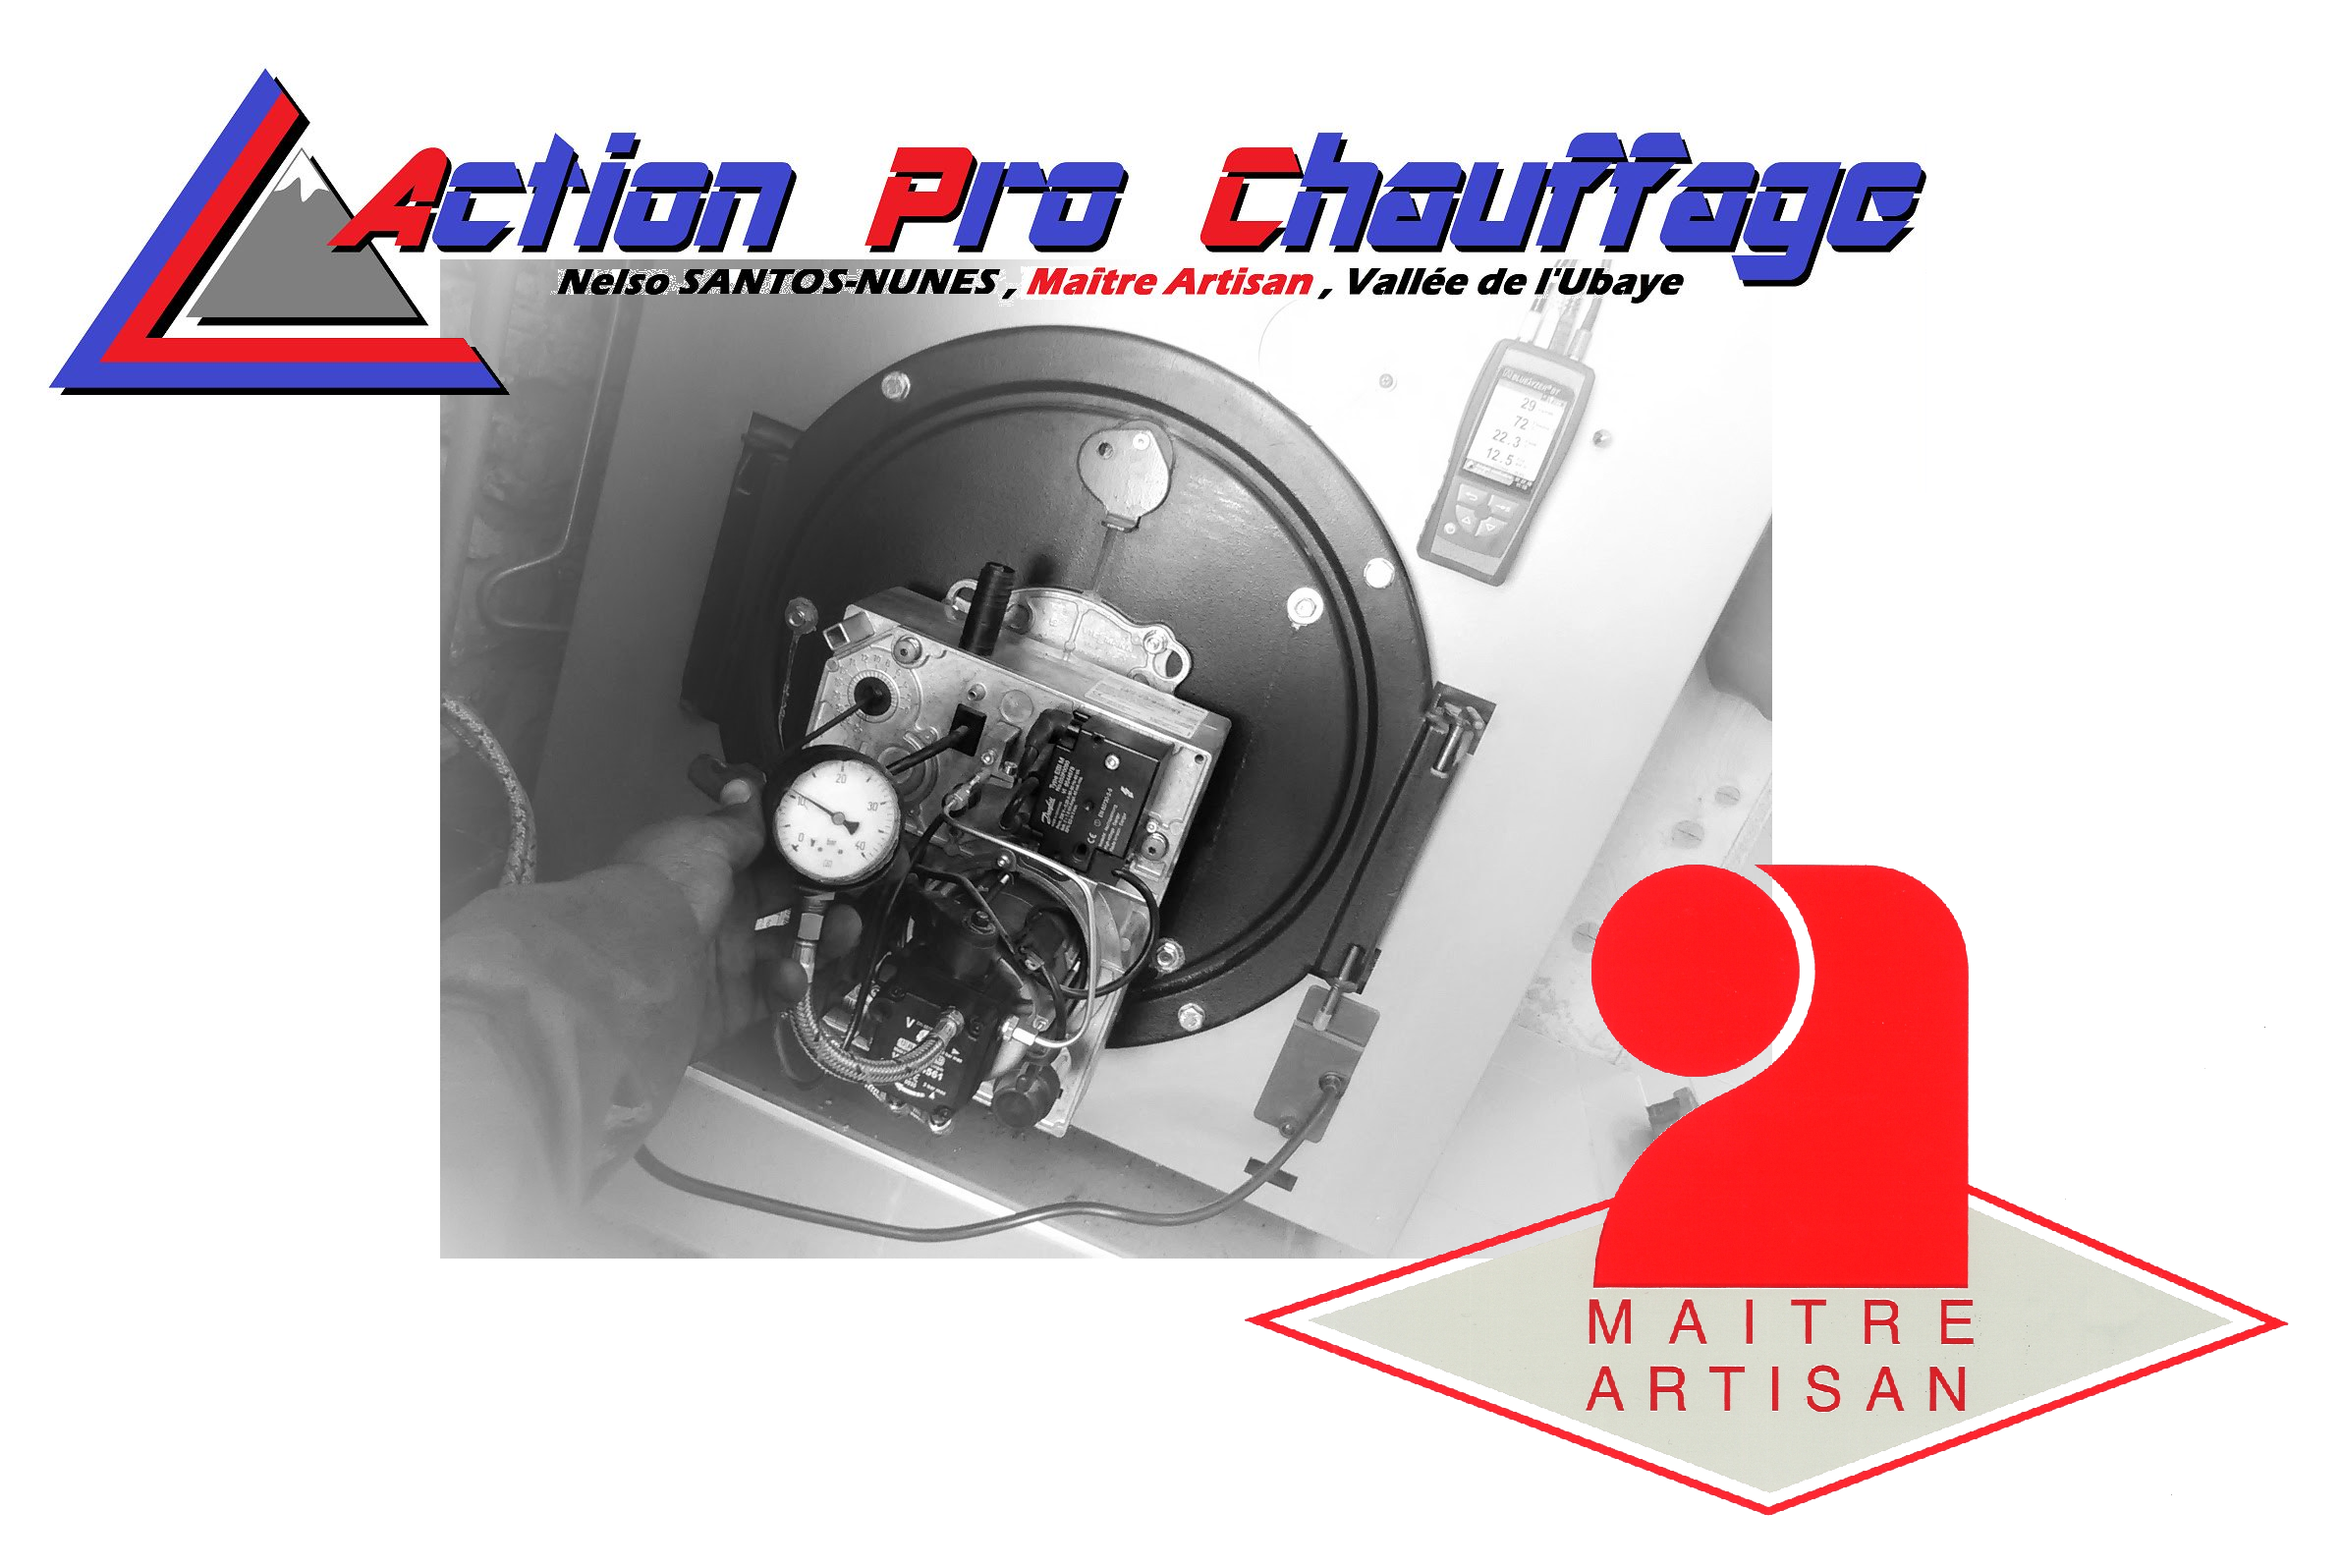 Action Pro Chauffage, Maître Artisan